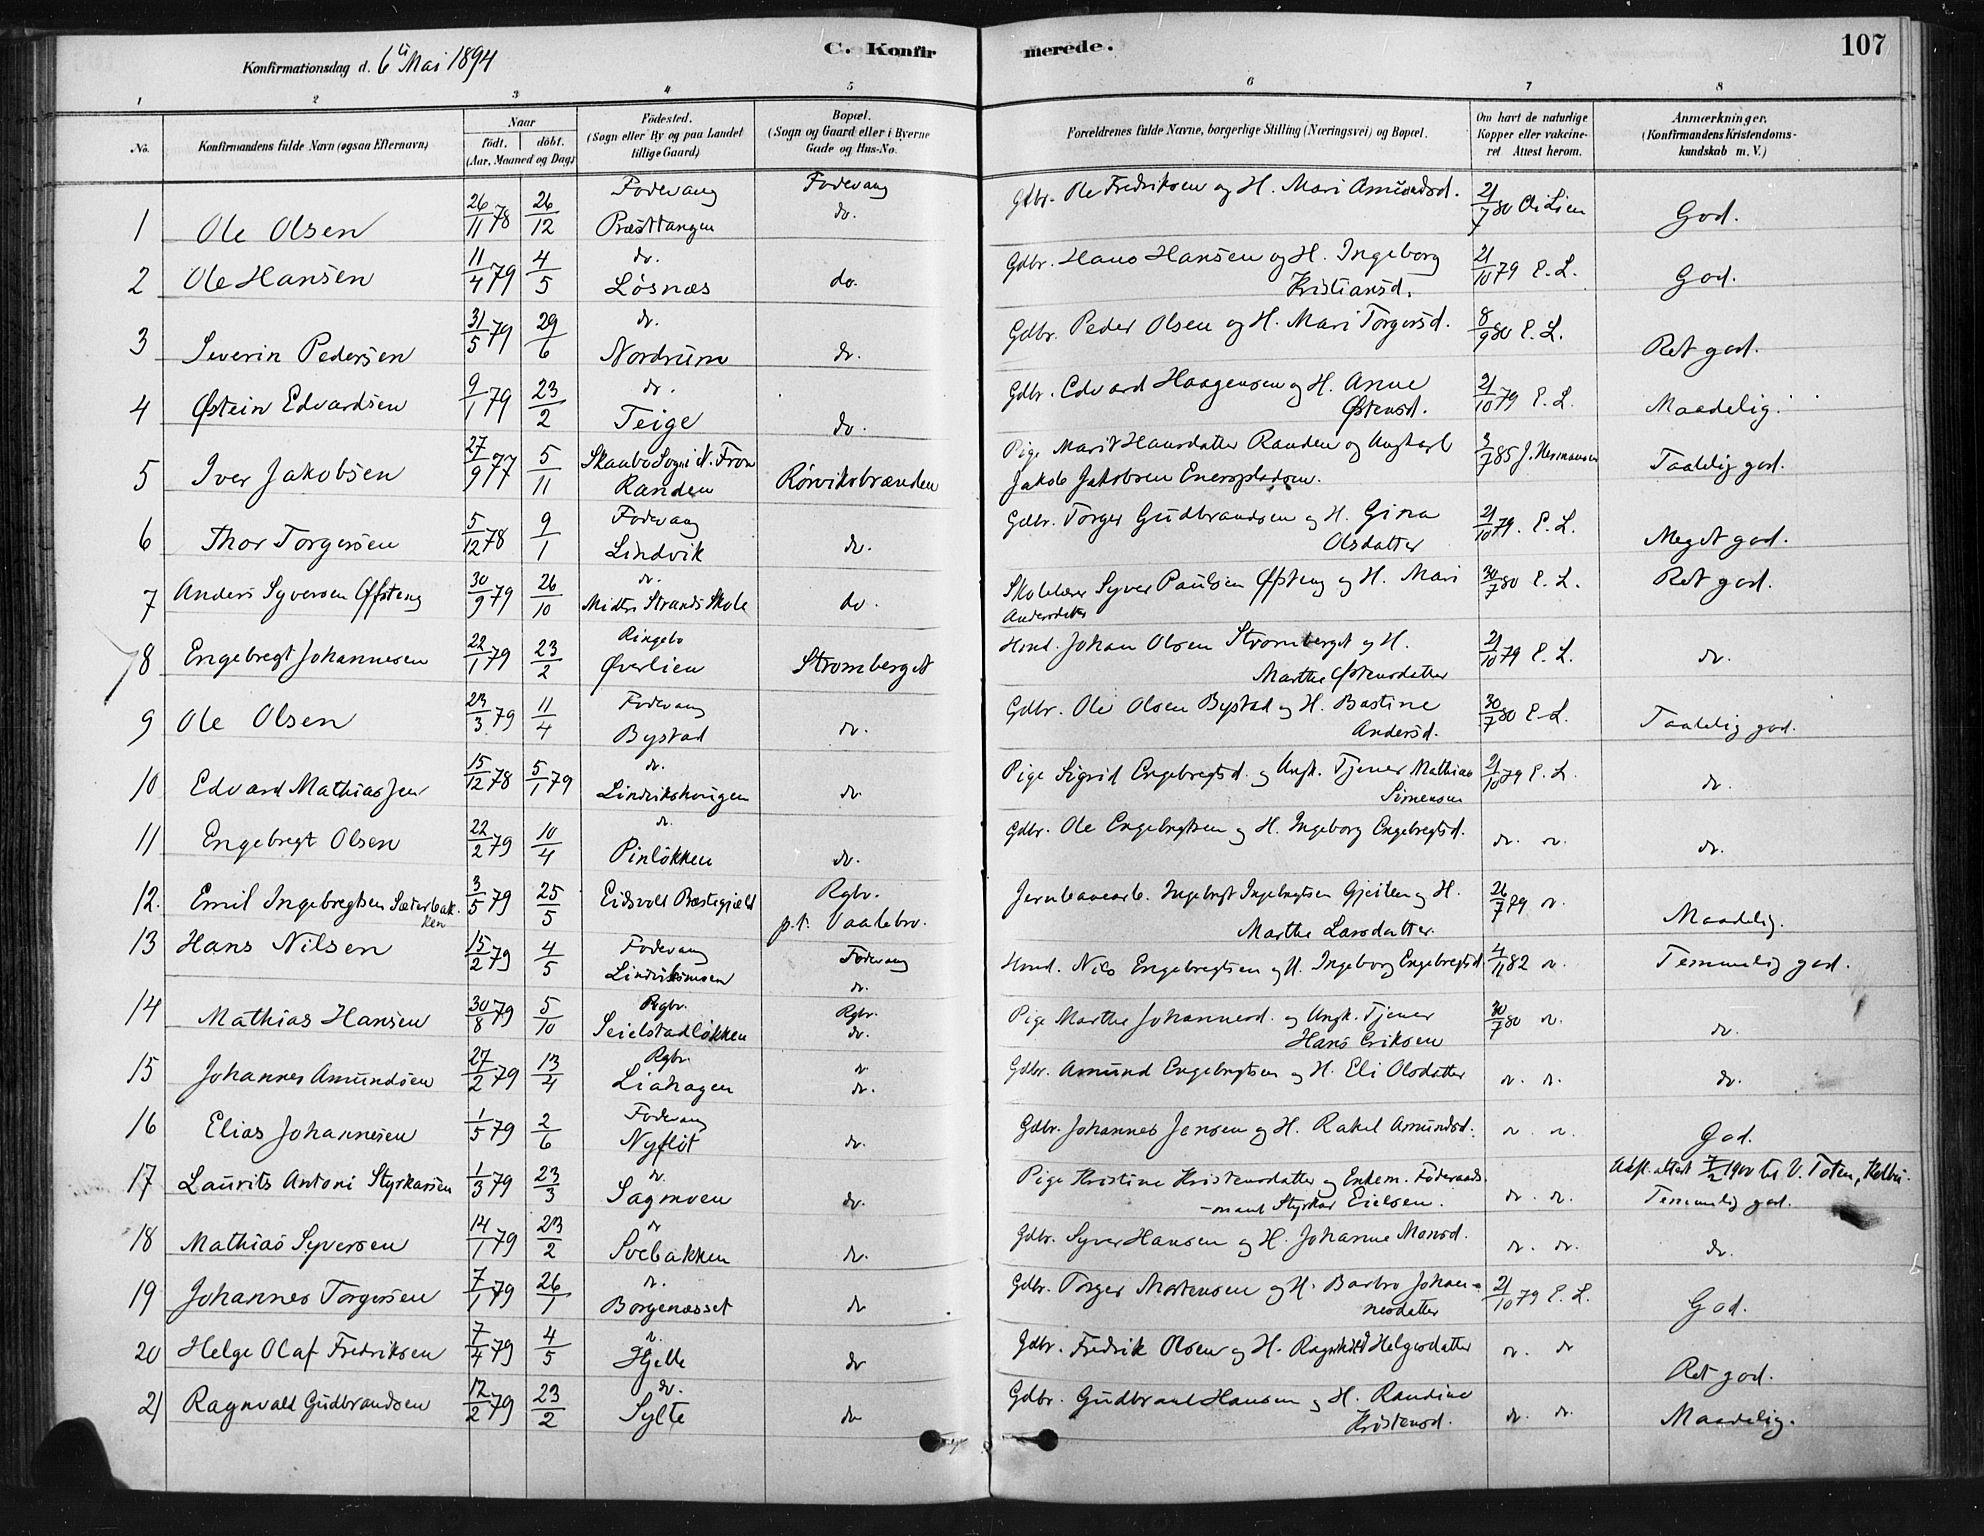 SAH, Ringebu prestekontor, Ministerialbok nr. 9, 1878-1898, s. 107